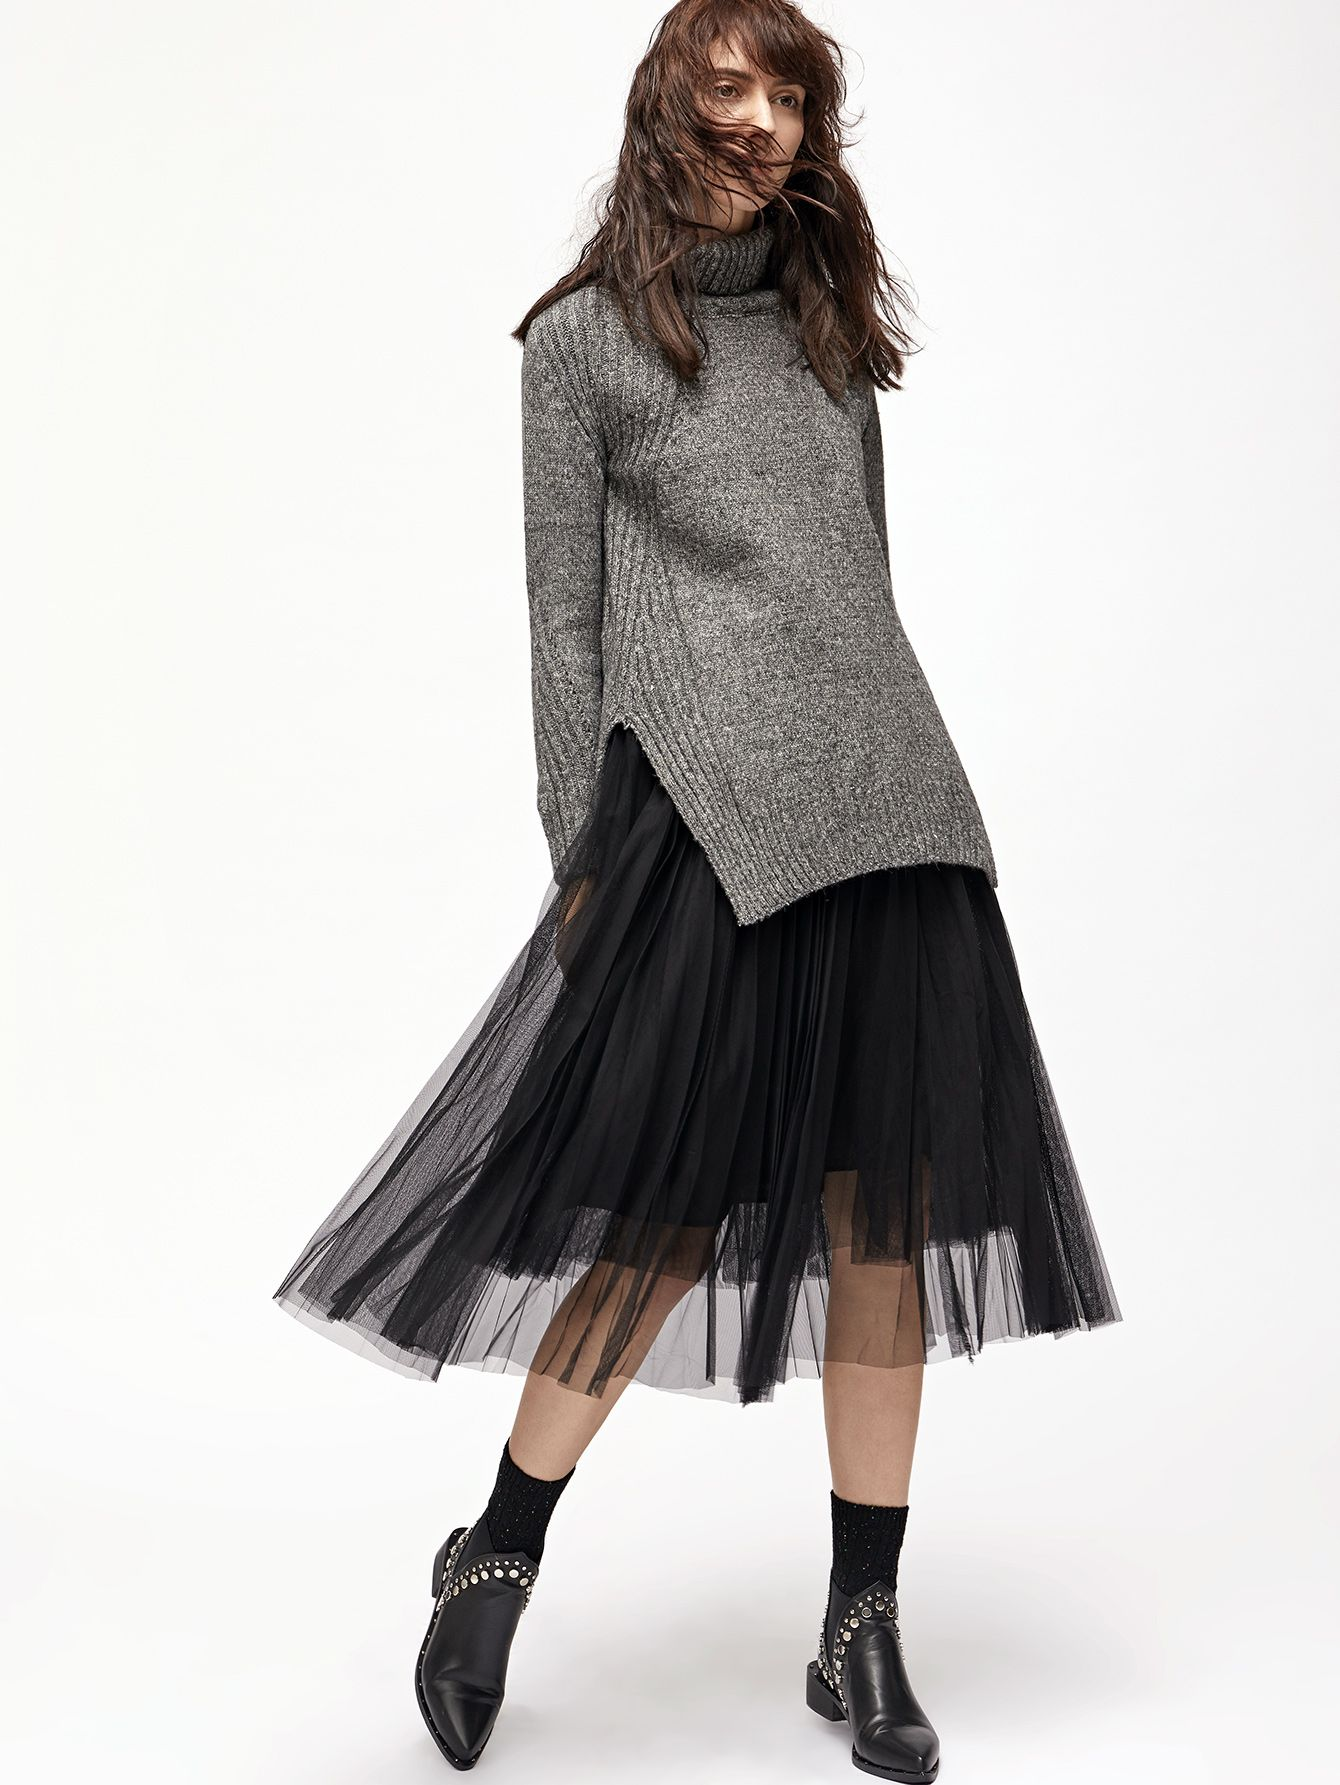 Black Mesh Pleated Elastic Waist Skirt -SheIn(Sheinside)